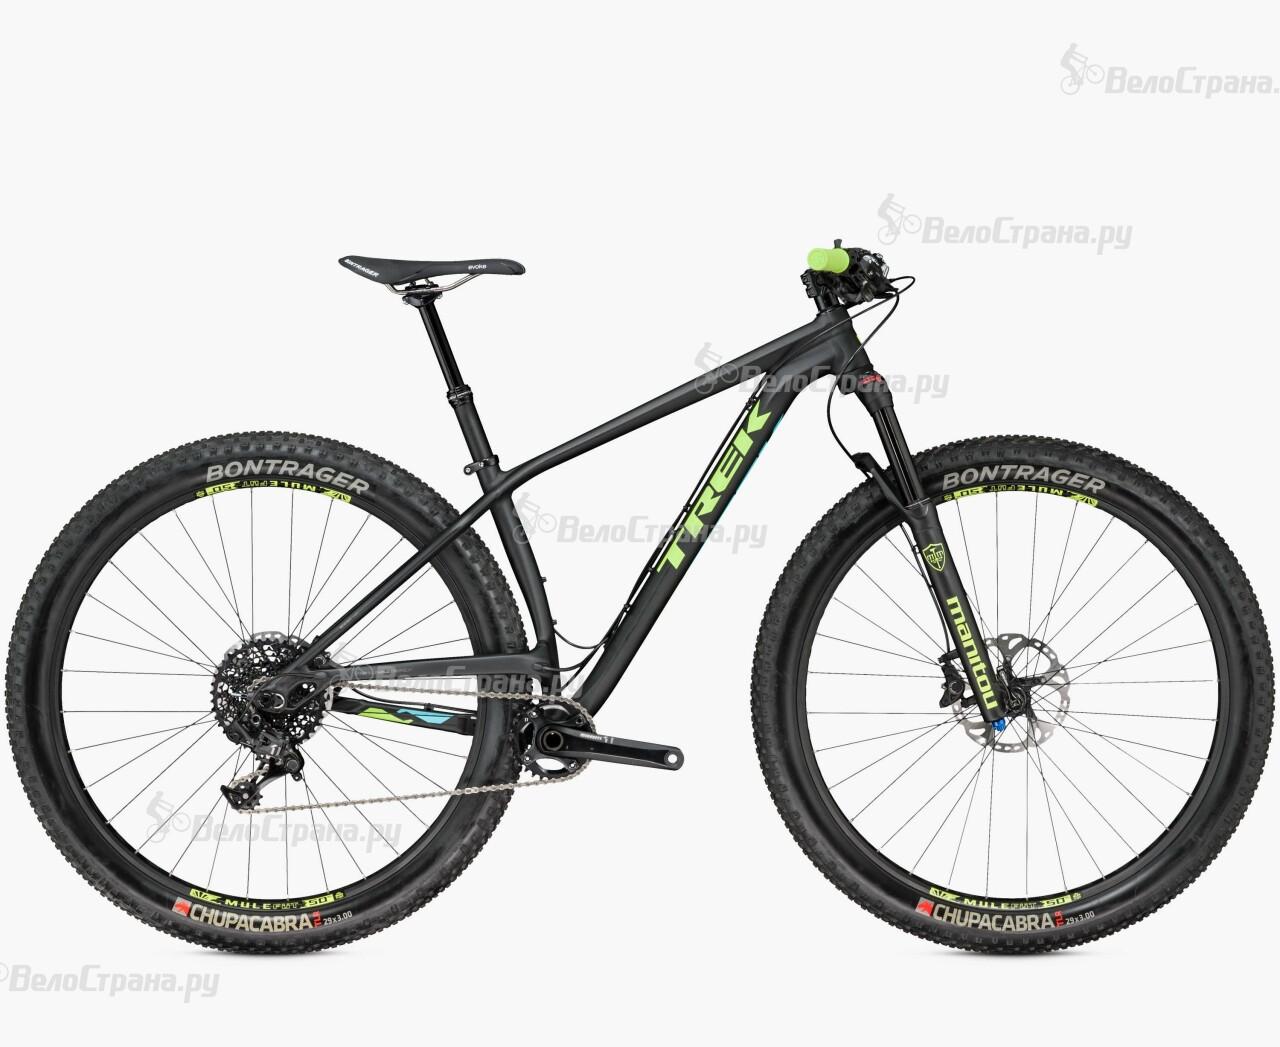 Велосипед Trek Stache 9 29+ (2016) trek stache 7 2014